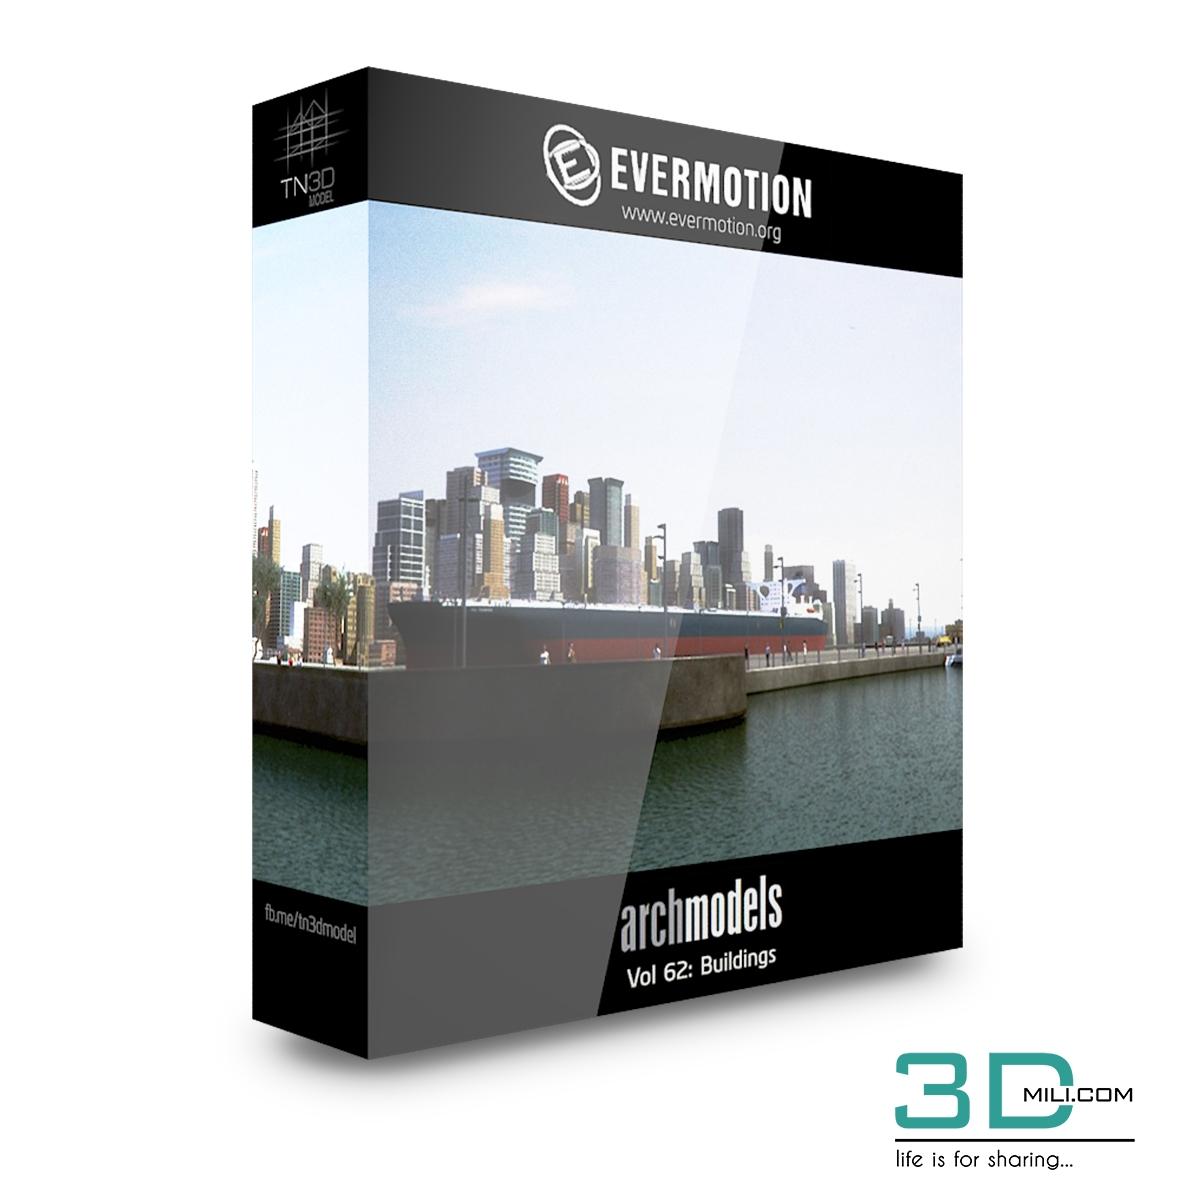 Evermotion Archmodels Vol 62: Buildings - 3D Mili - Download